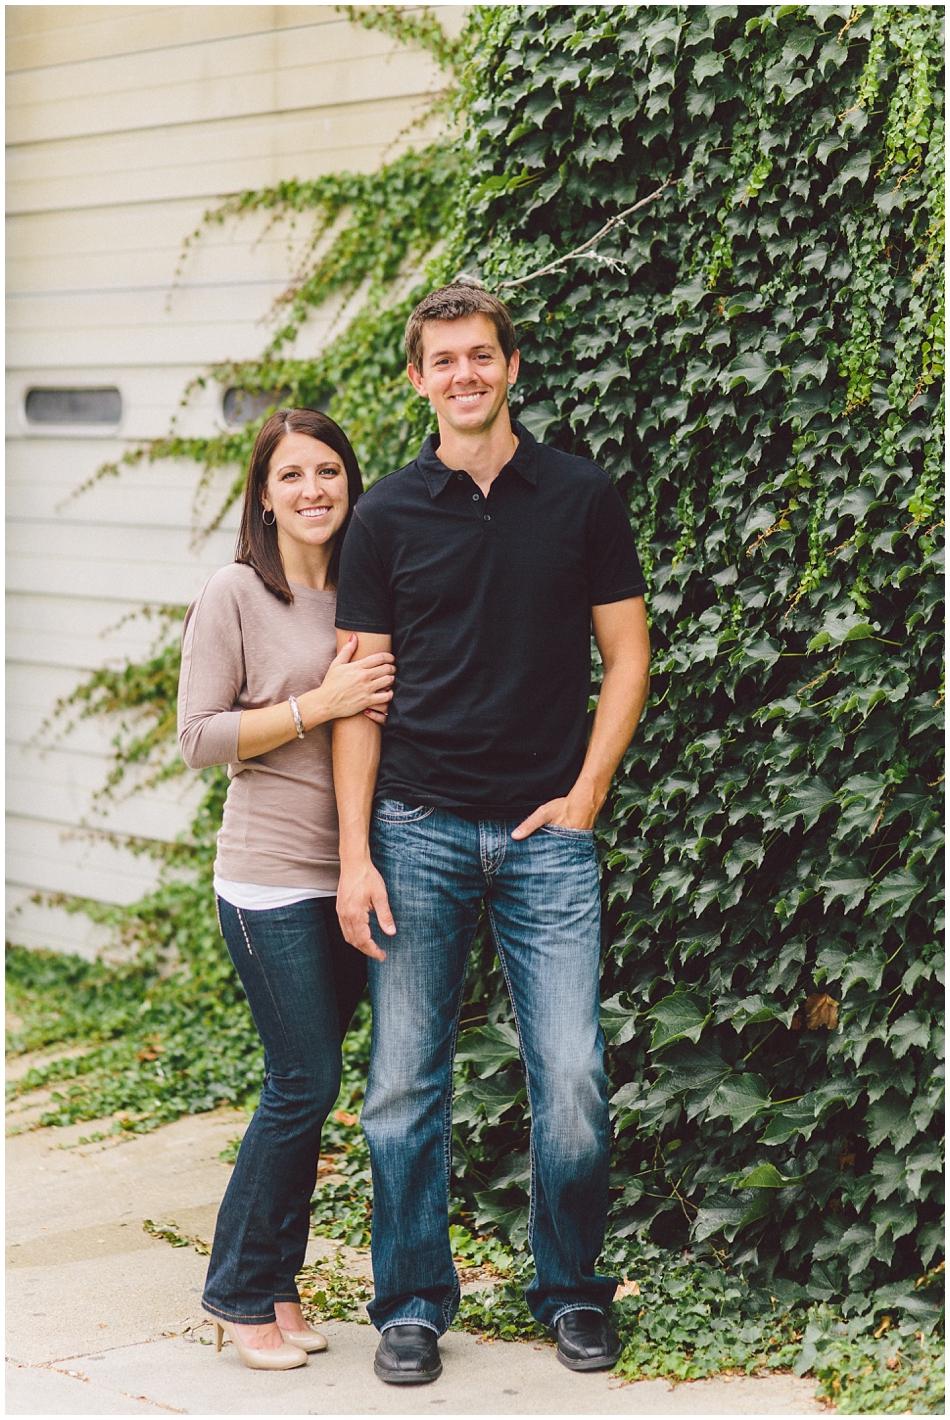 Cute couple in Old Market Omaha, Nebraska